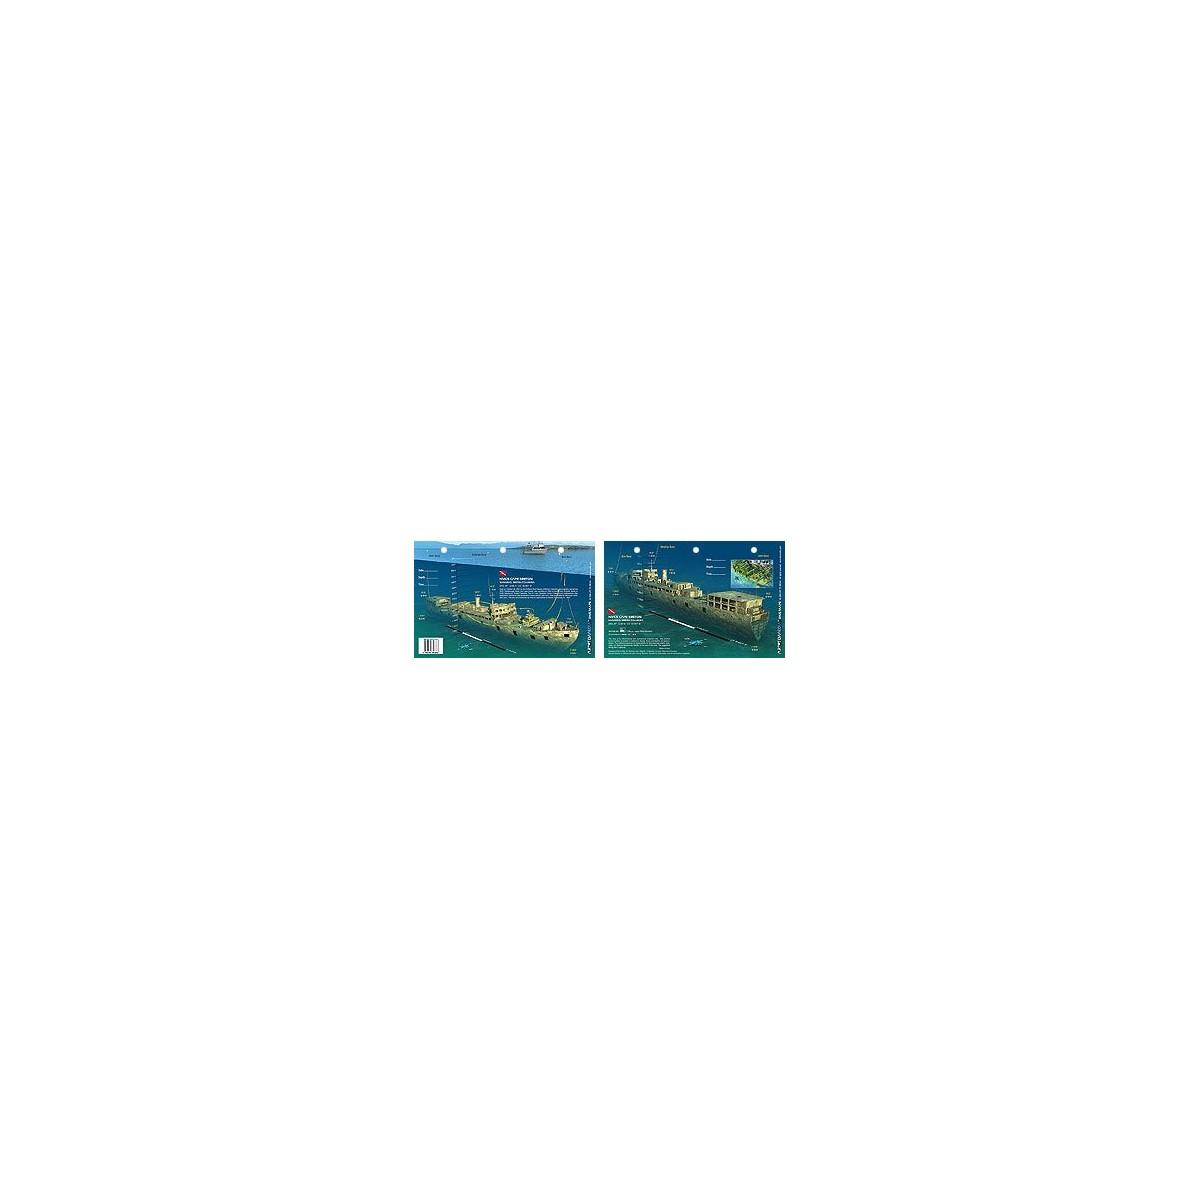 HMCS Cape Breton in Nanaimo, British Columbia, Canada (8.5 x 5.5 Inches) - New Art to Media Underwater Waterproof 3D Dive Site M